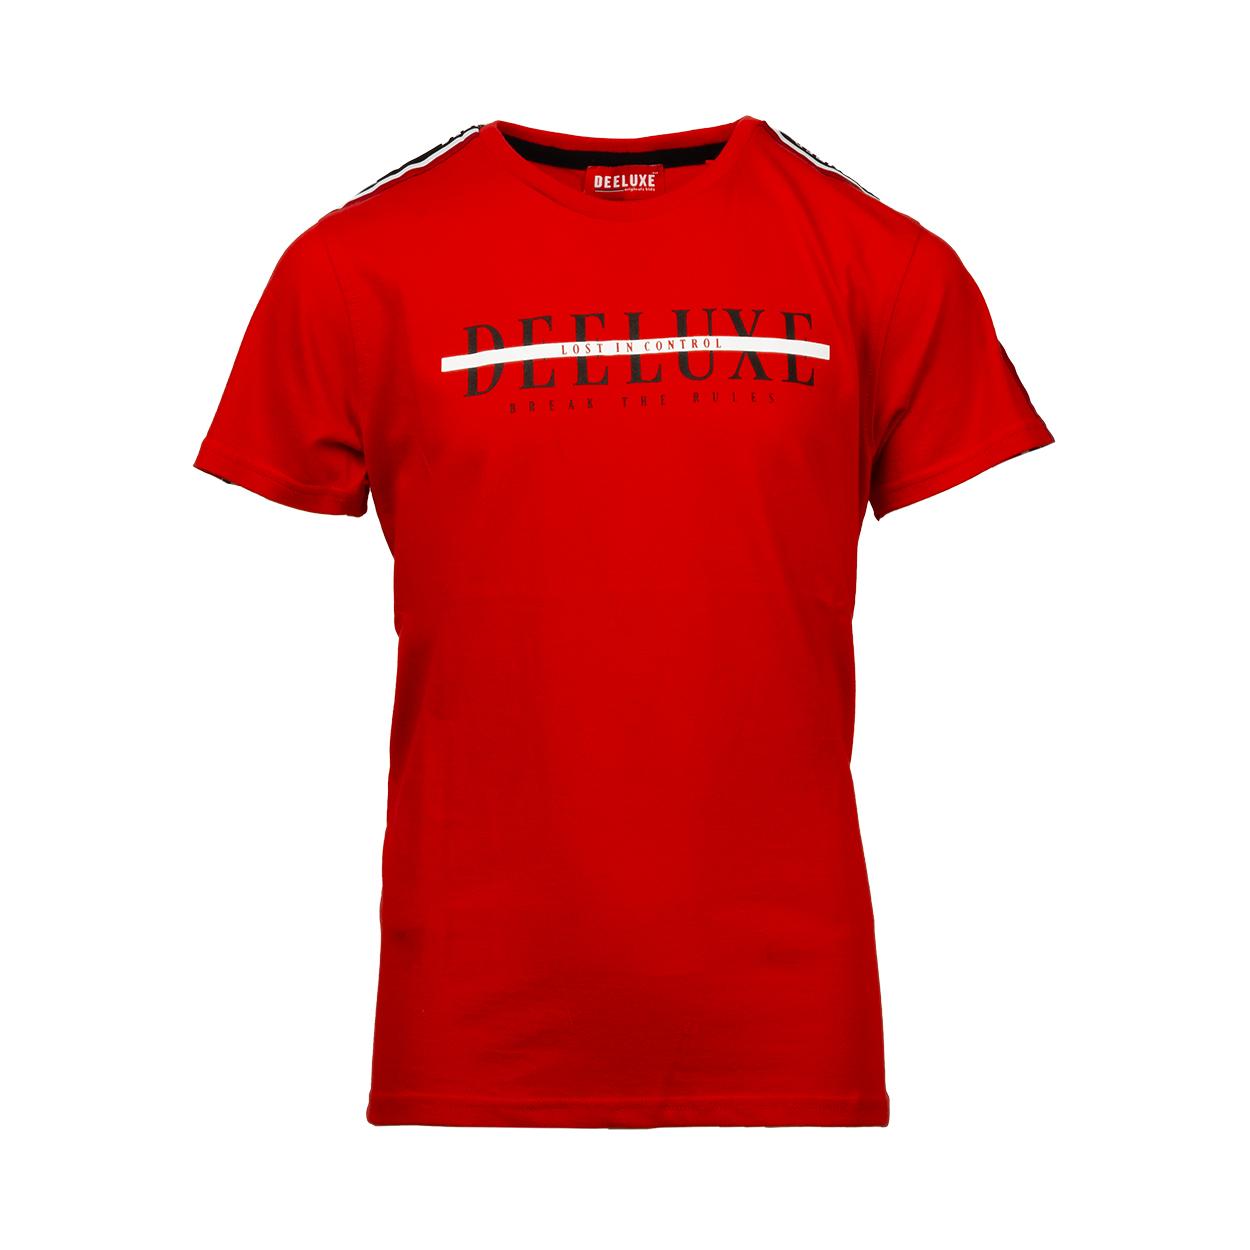 Tee-shirt col rond  ralf en coton rouge floqué